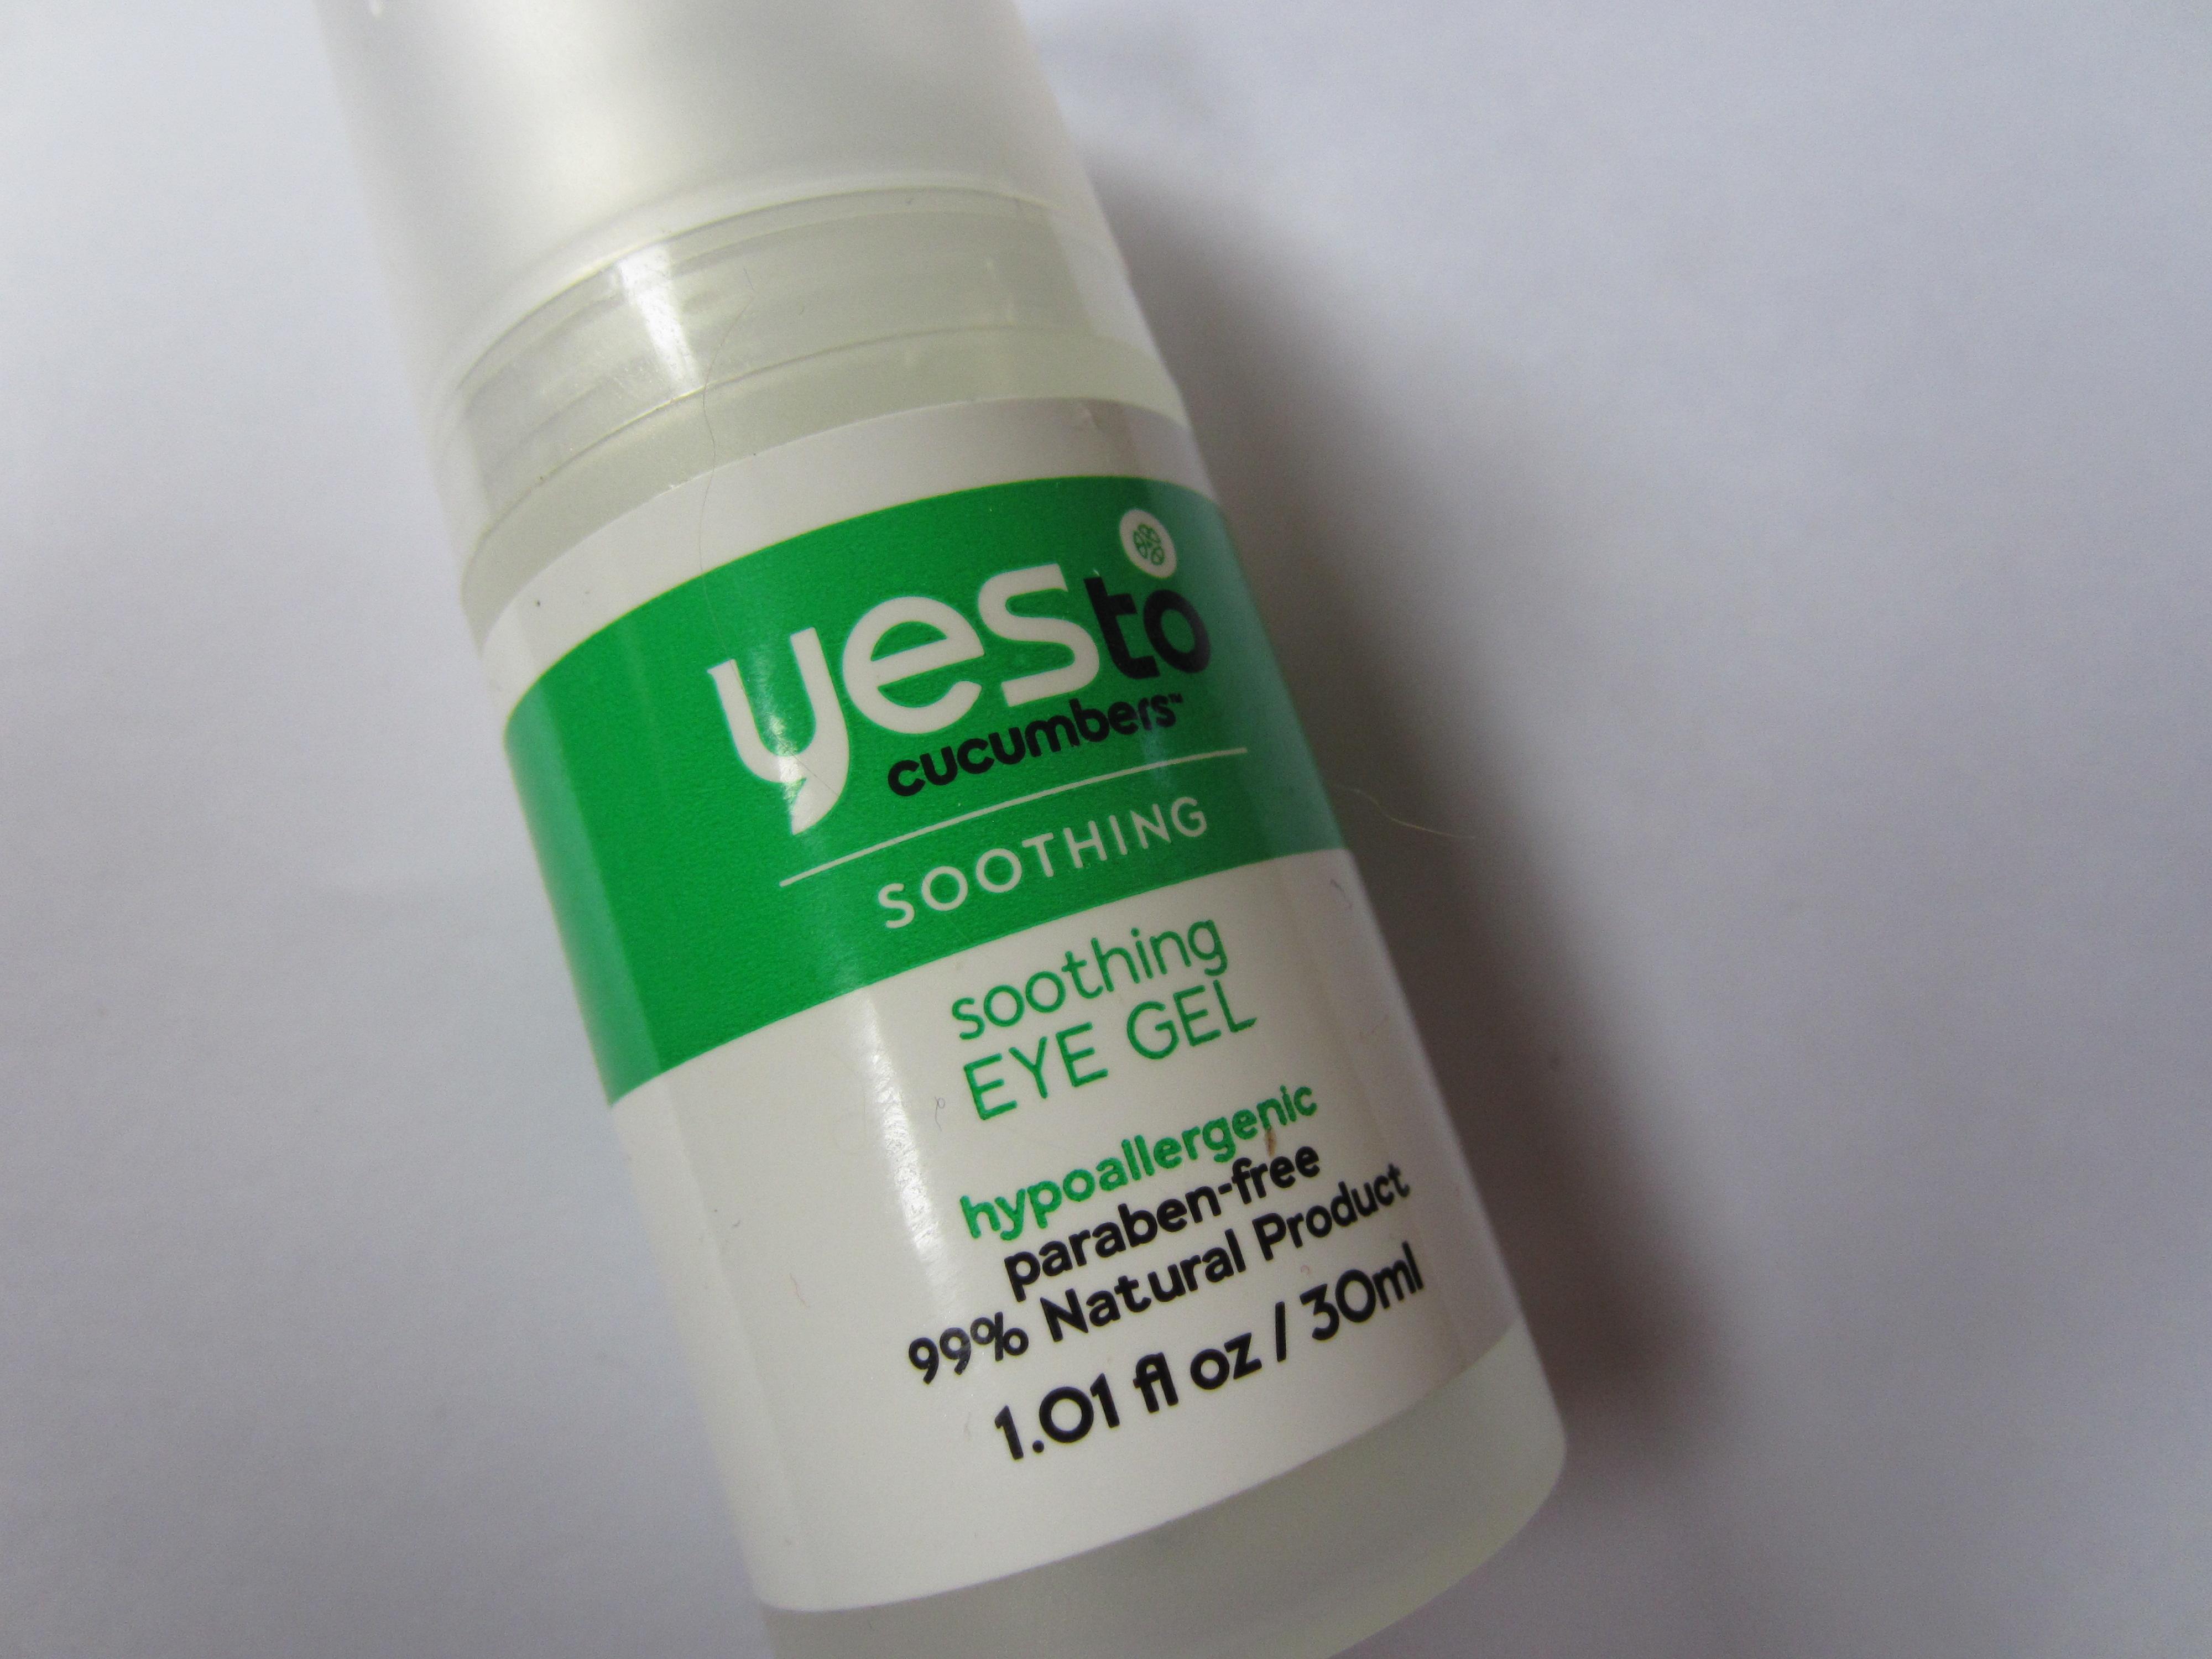 Yes to eye gel